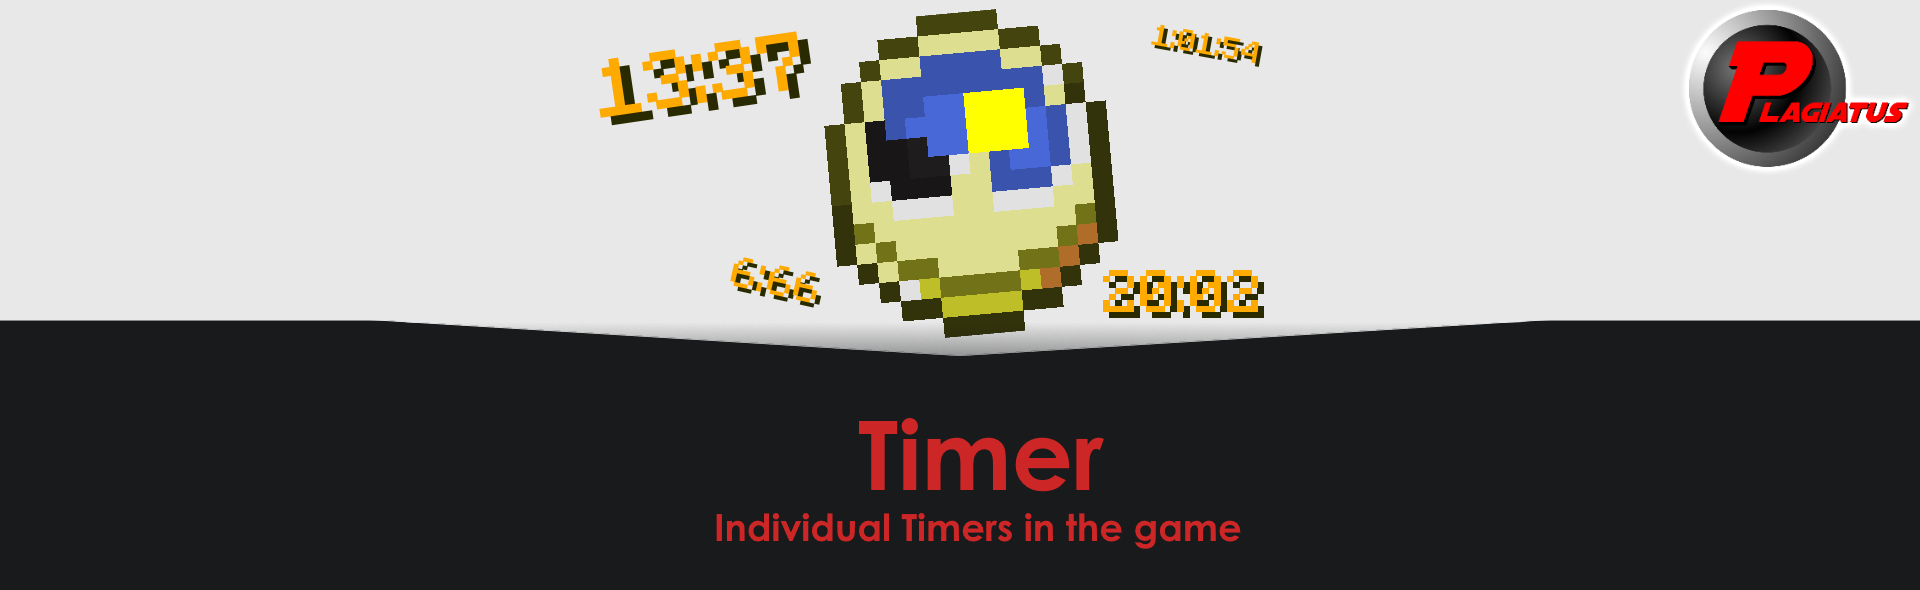 Timer Banner